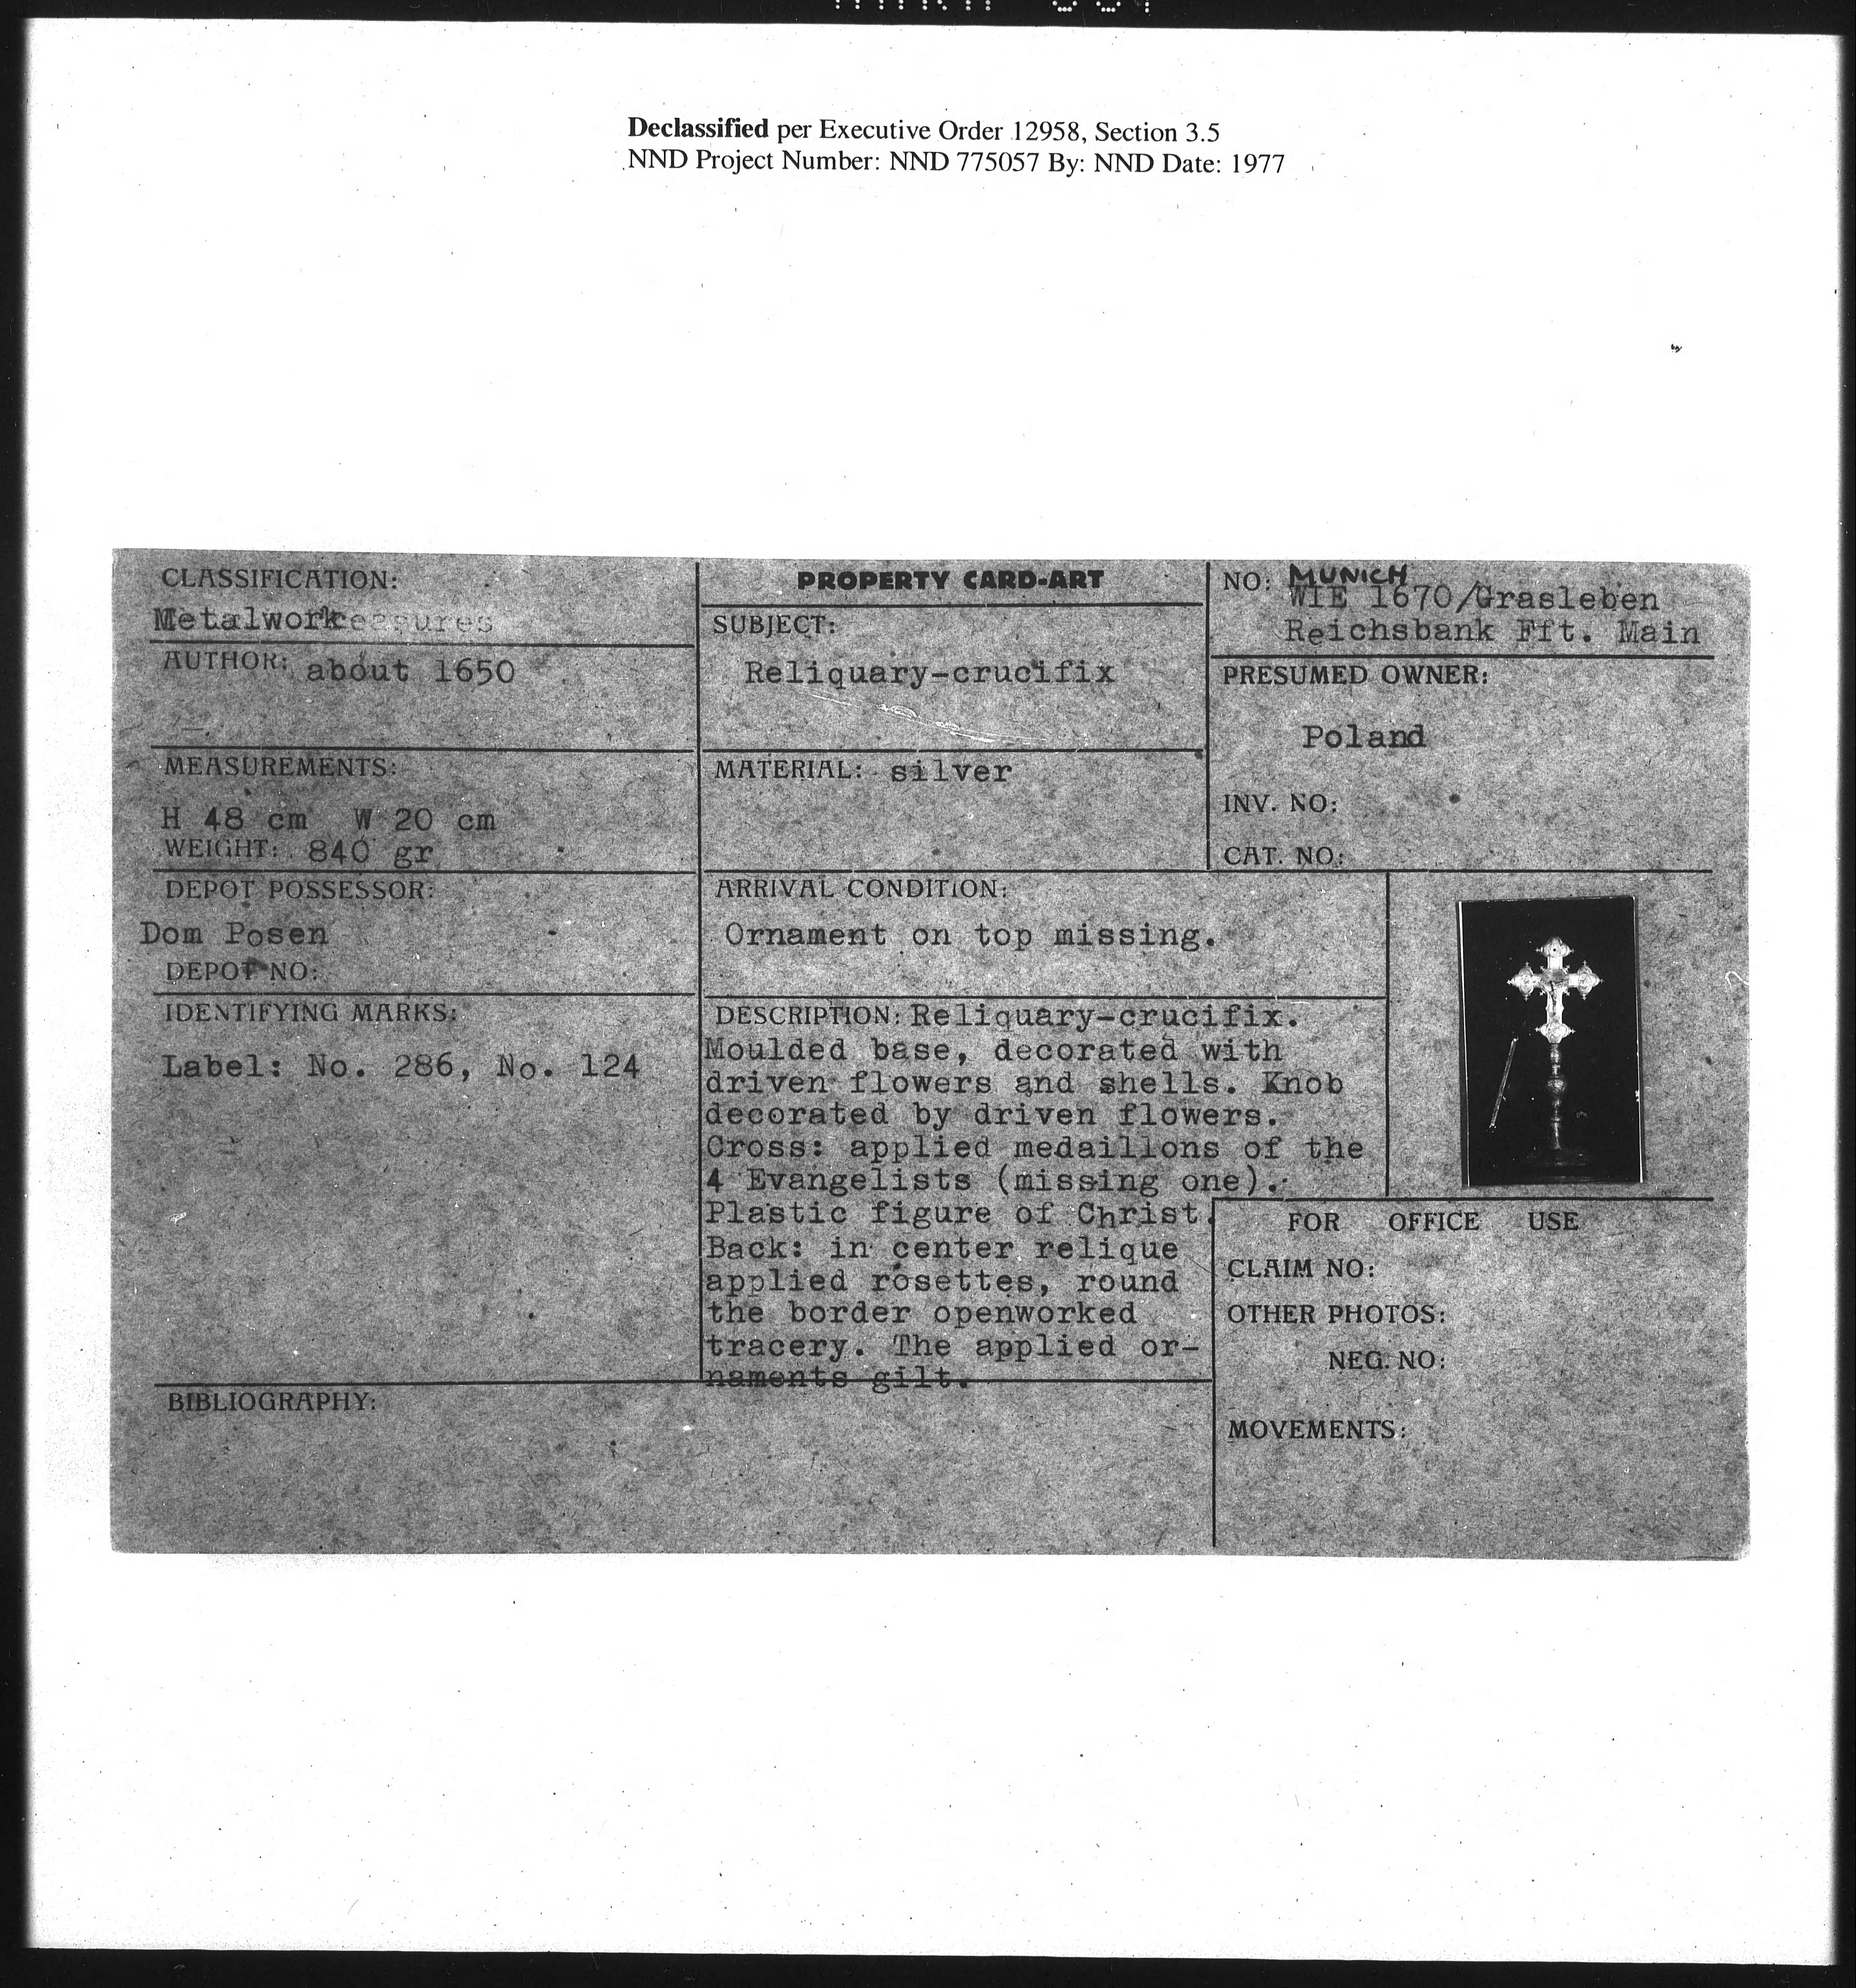 Metalwork: WIE 1670, Reliquary-Crucifix